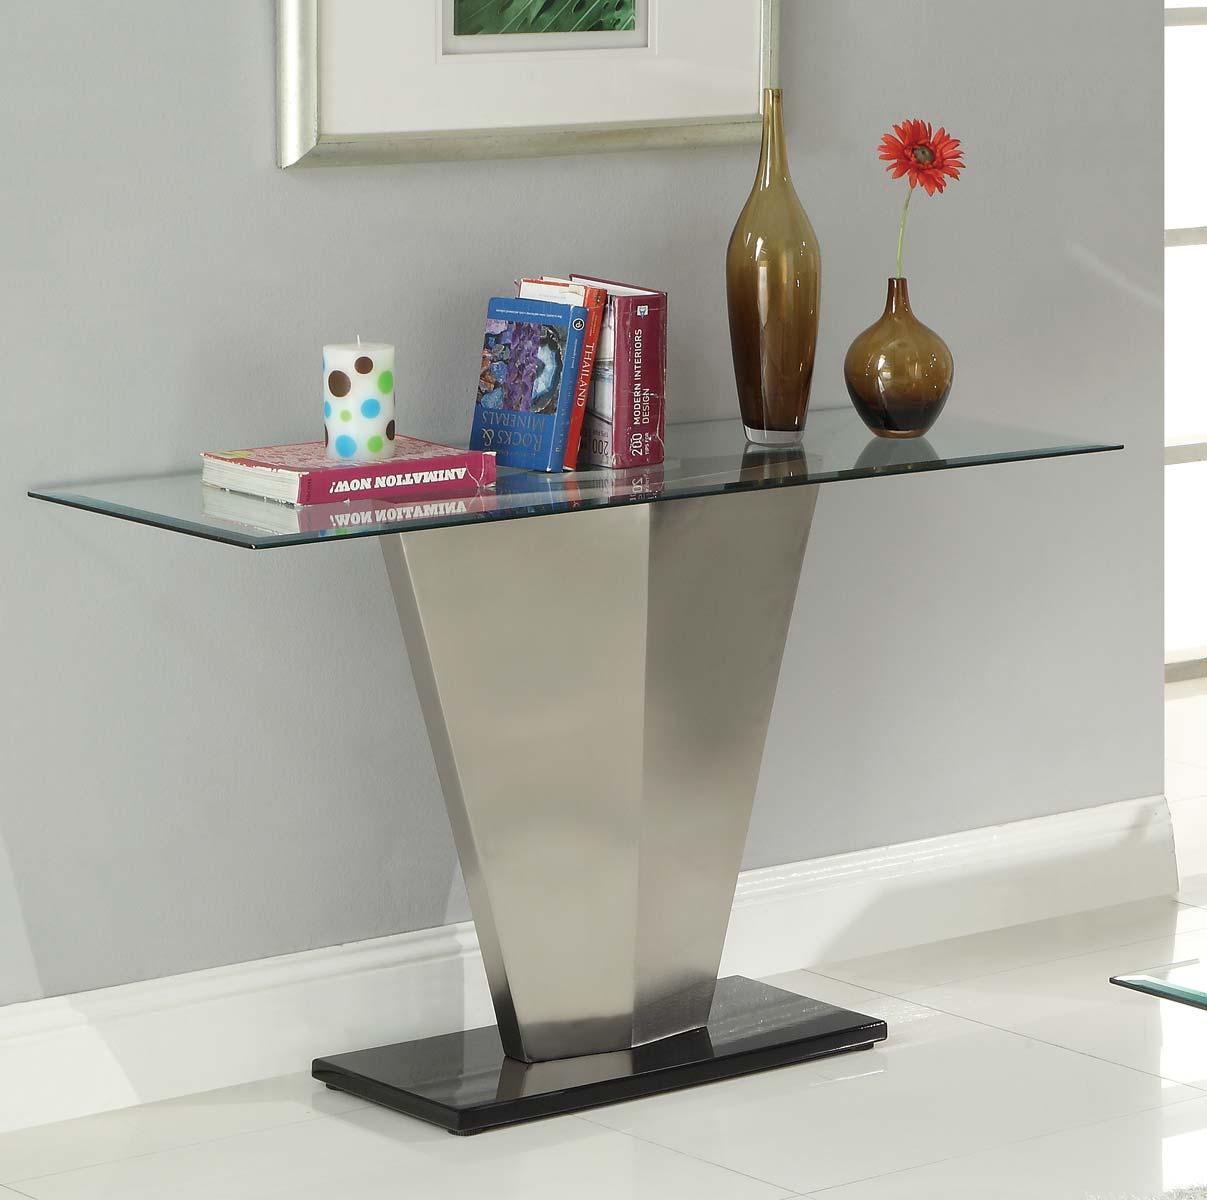 Homelegance Silverstone Sofa Table - Brushed Chrome� 3455-05